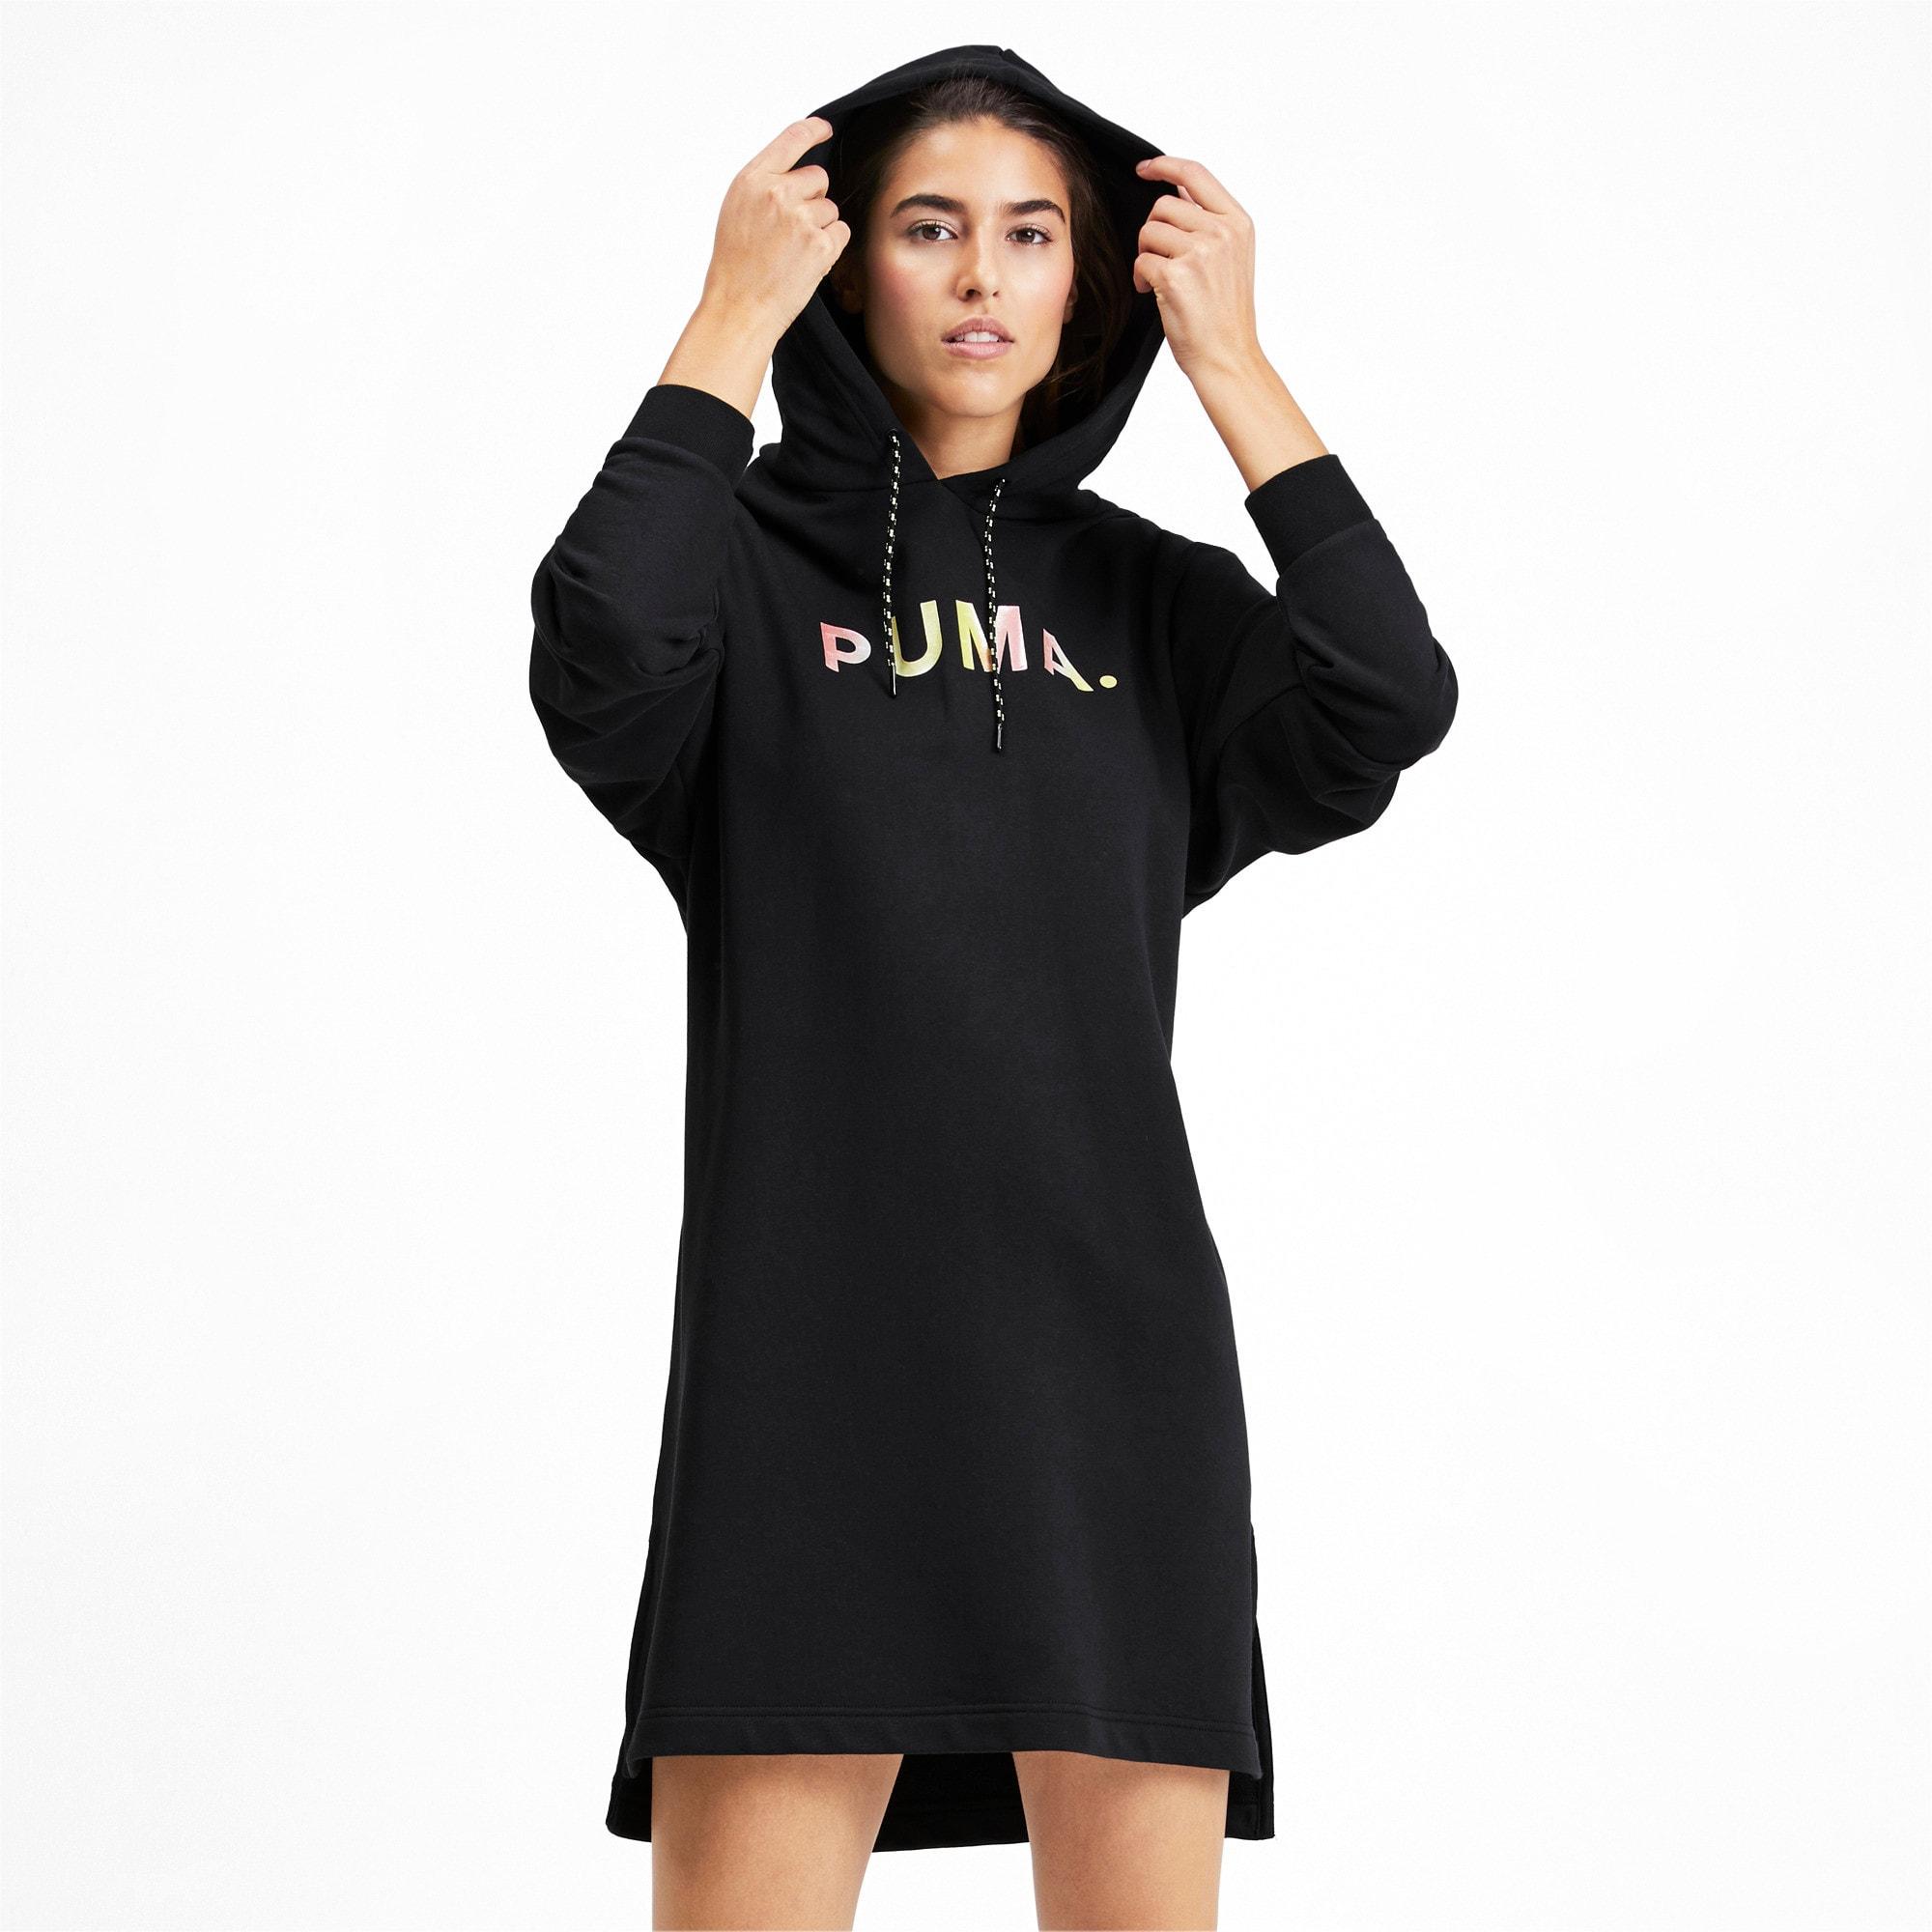 Thumbnail 1 of Chase Women's Hooded Dress, Puma Black, medium